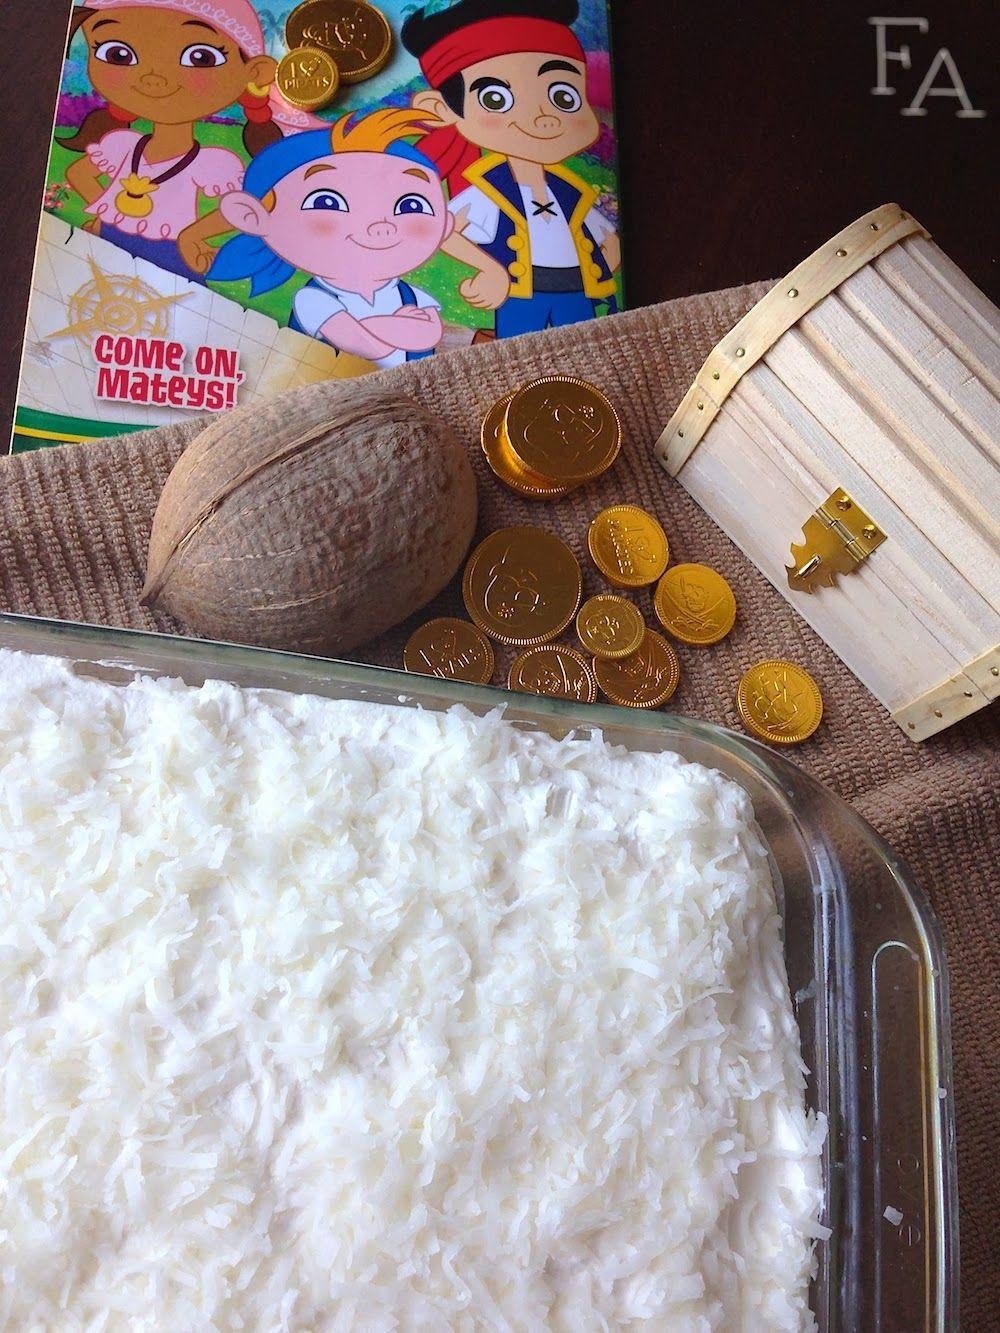 Cubby's Coconut Cake for #DisneyJunior's #JakeandtheNeverlandPirates!